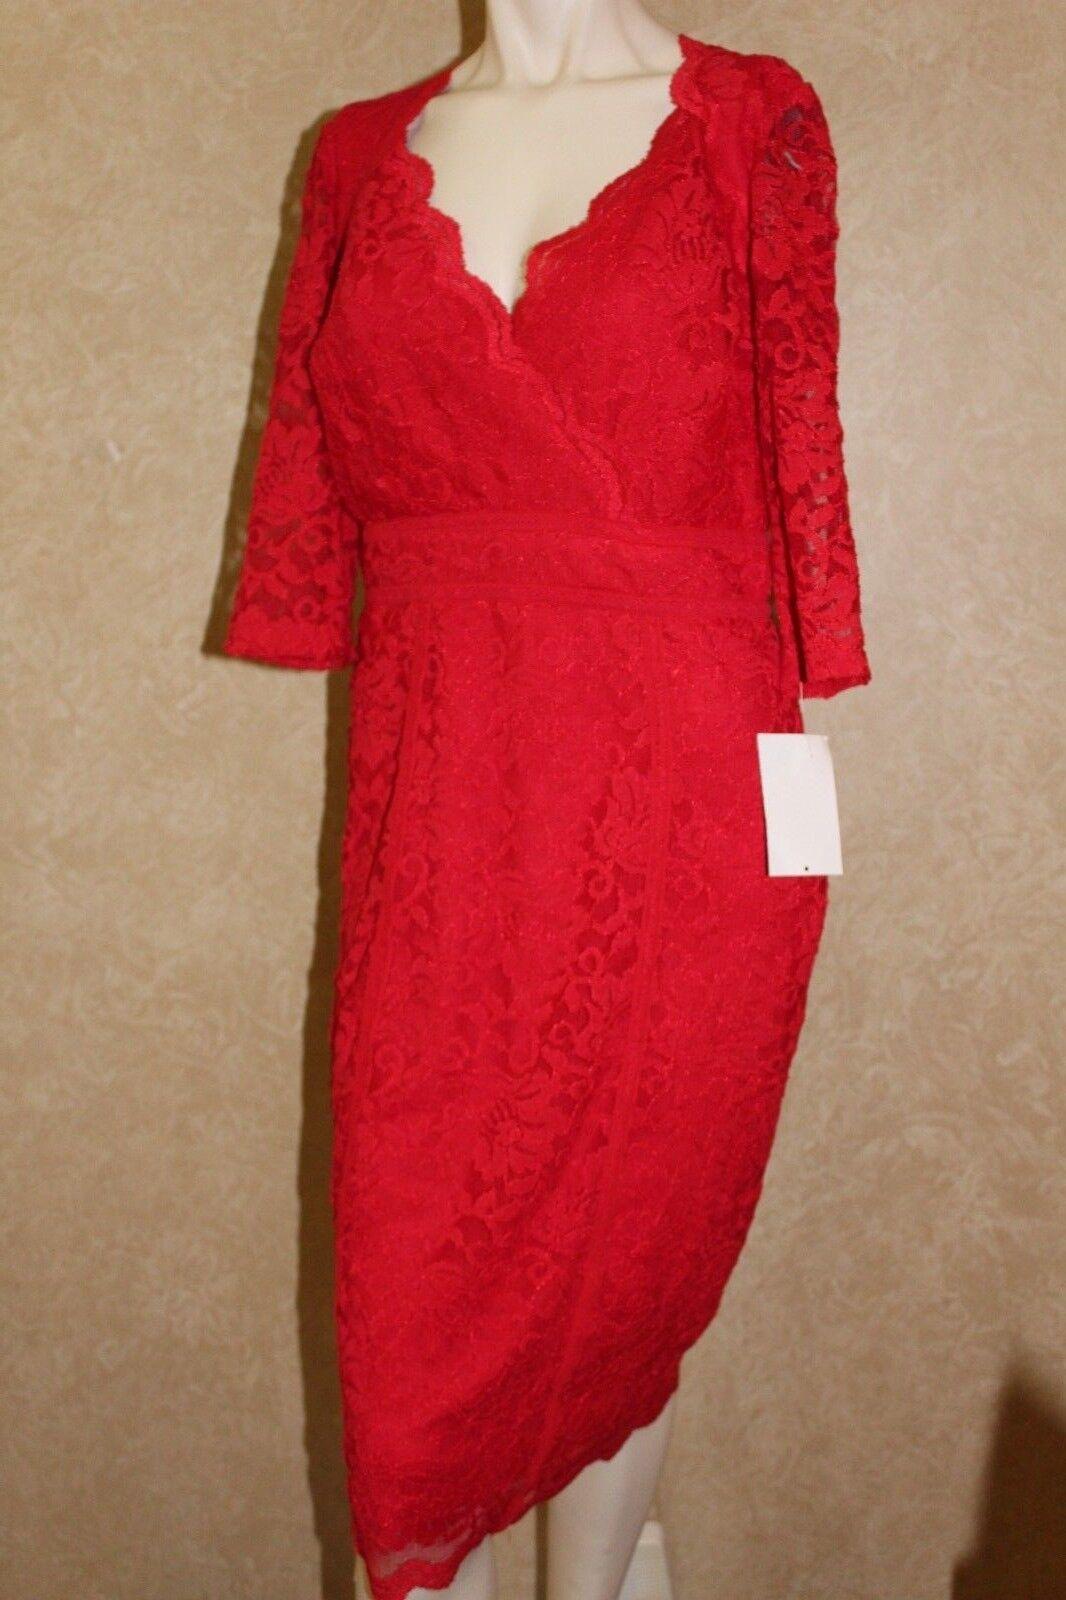 Thalia Sodi  Red Lace Dress Floral  S  ________________________ R21-1